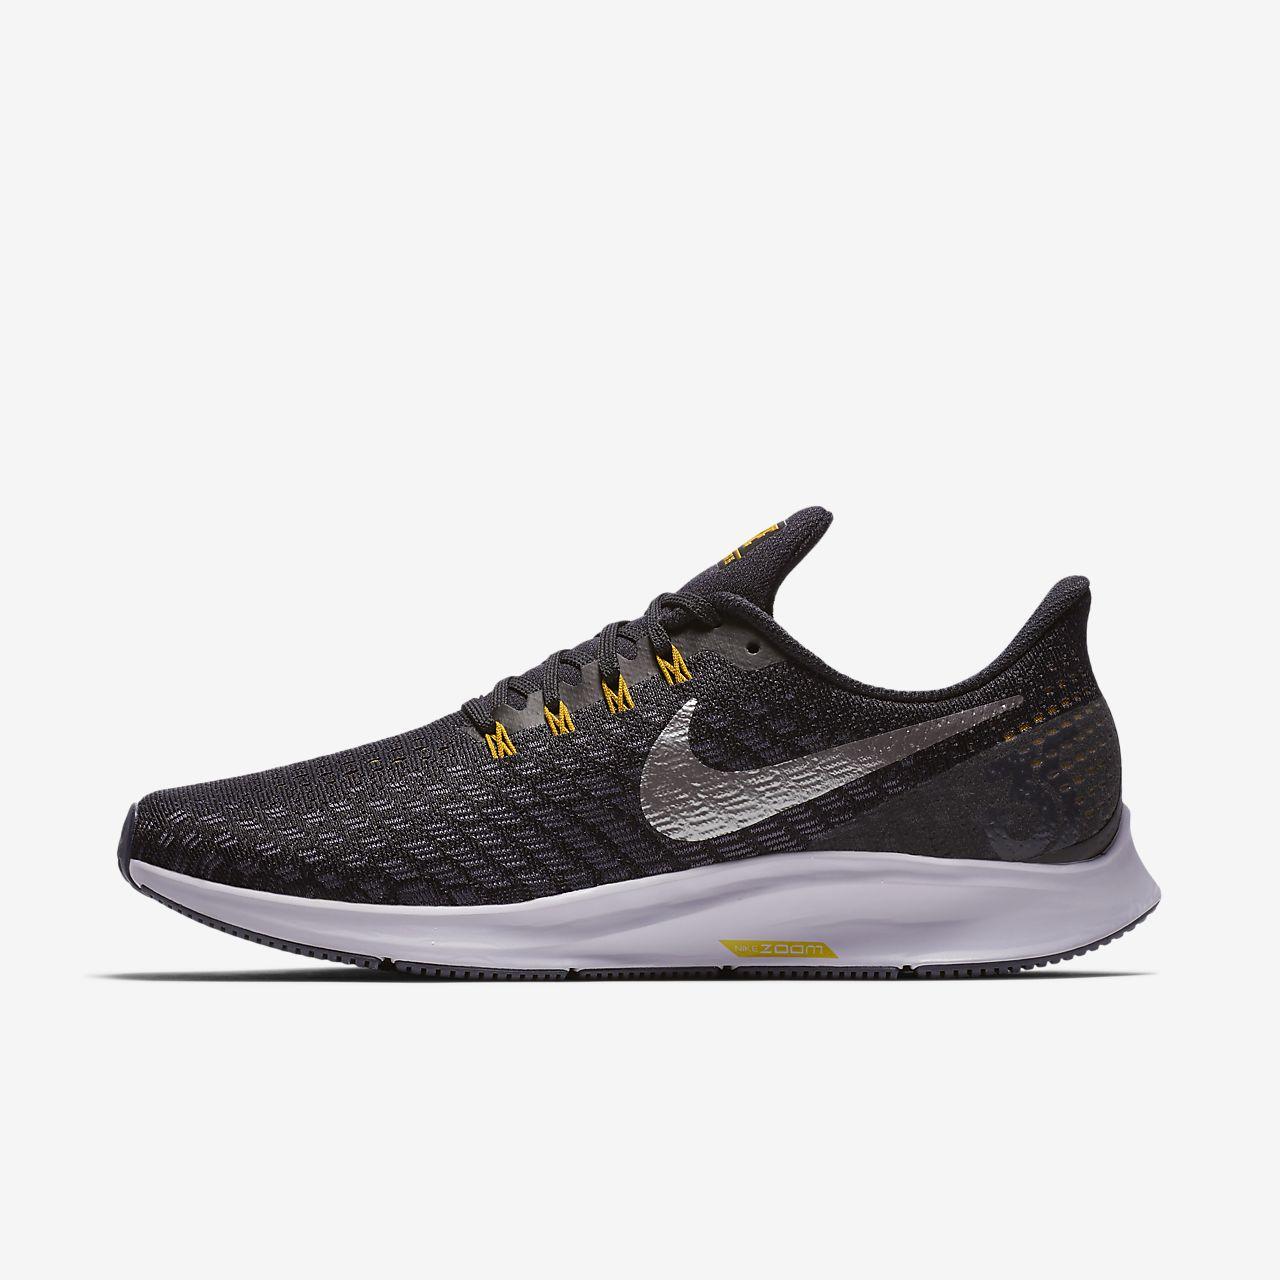 online store c76ee 0e2b9 ... Calzado de running para hombre Nike Air Zoom Pegasus 35